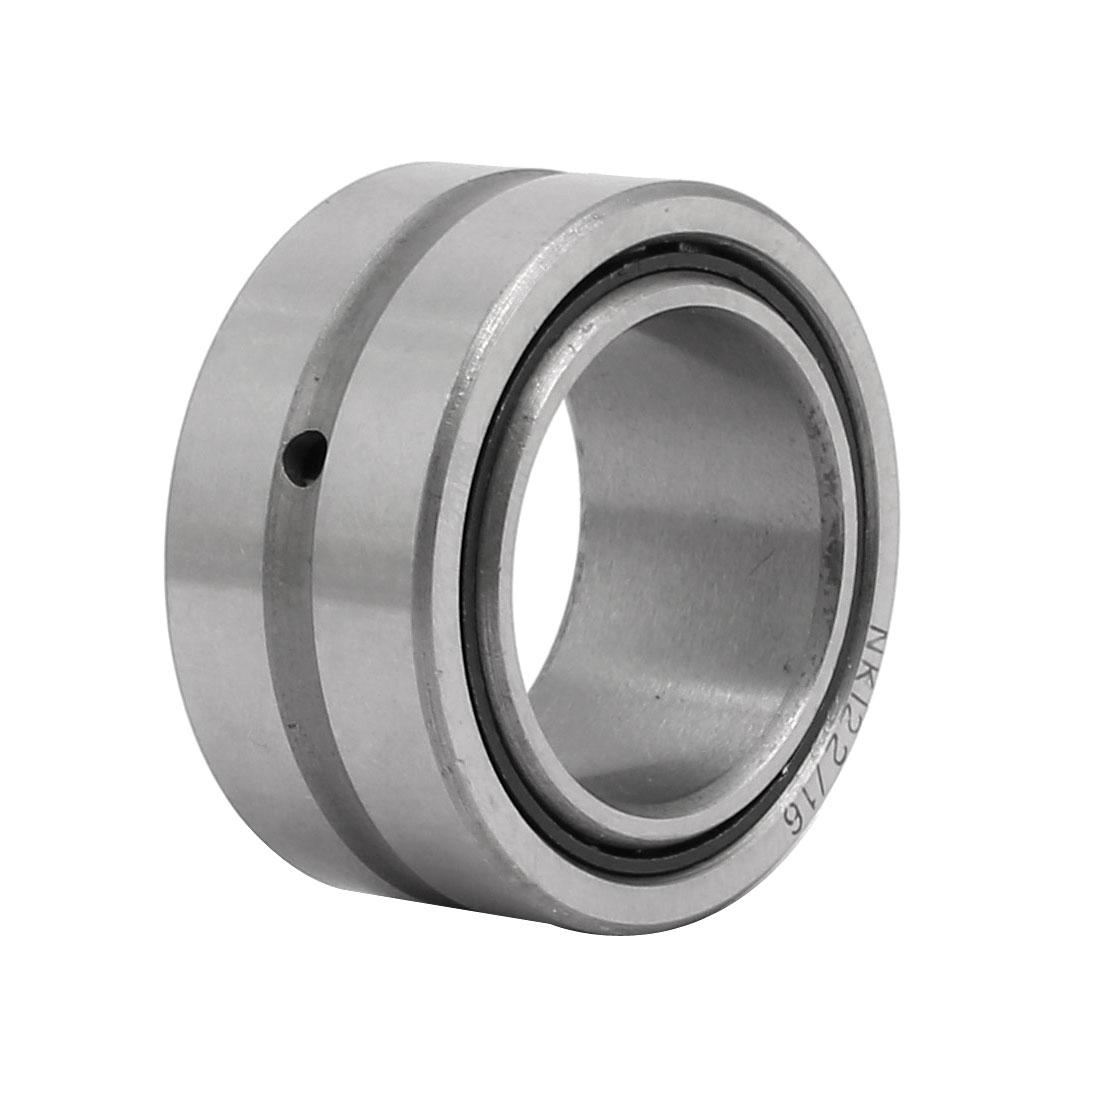 NKI22/16 22mmx34mmx16mm Inner Ring Needle Roller Bearing Silver Tone